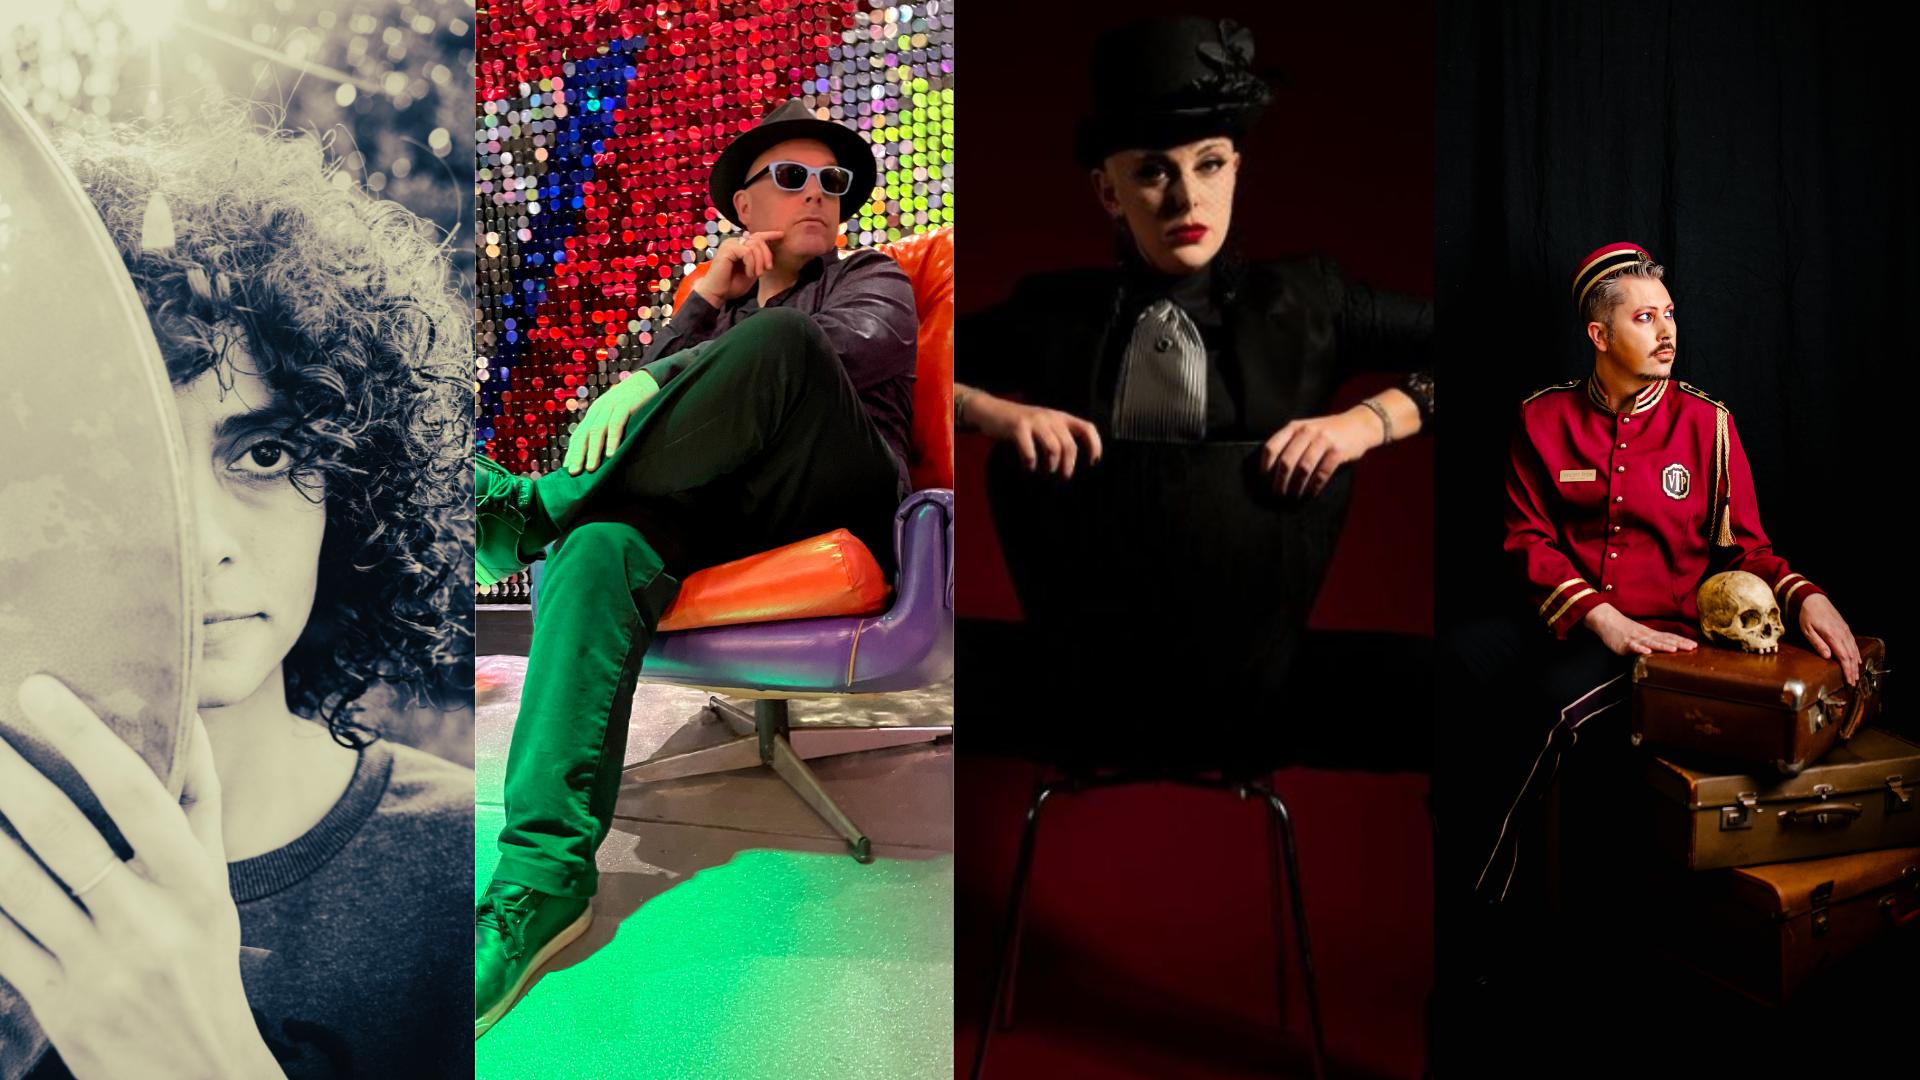 Adam Rudegeair & The Magnificence Trio, Jaleh, Alikeen Killer + Vincent Prize